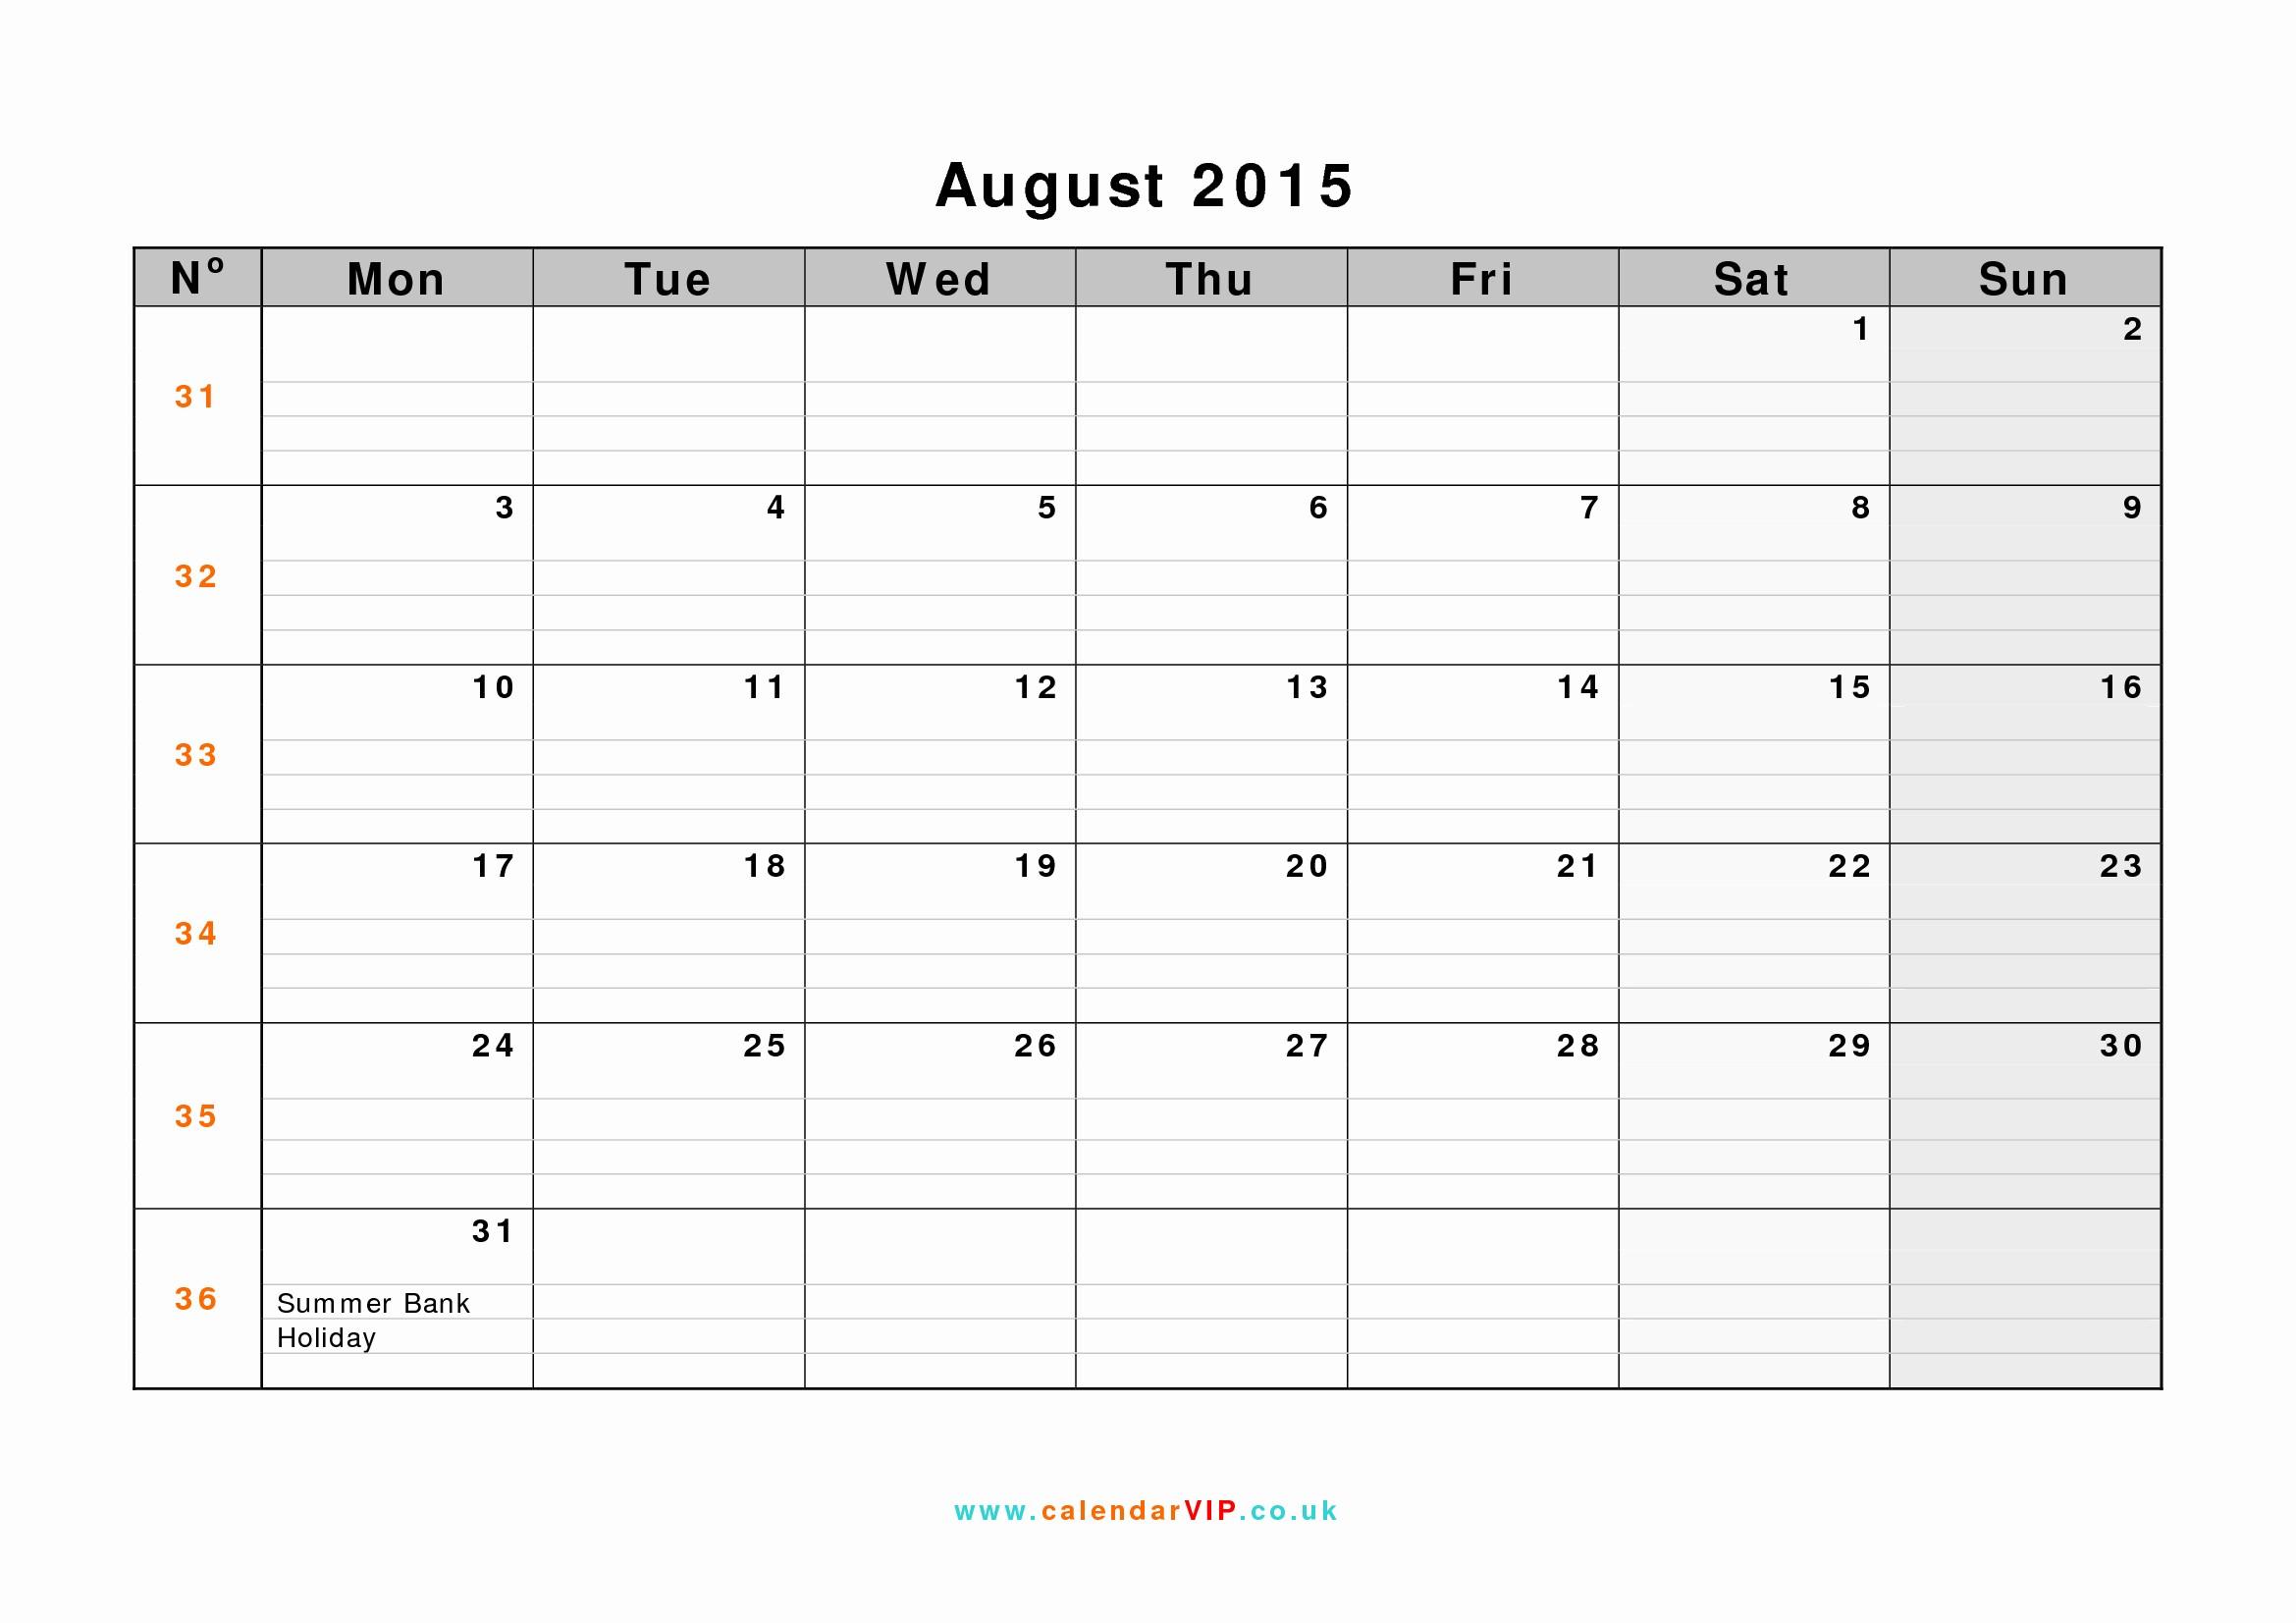 Free Calendar Templates August 2015 New August 2015 Calendar Free Monthly Calendar Templates for Uk